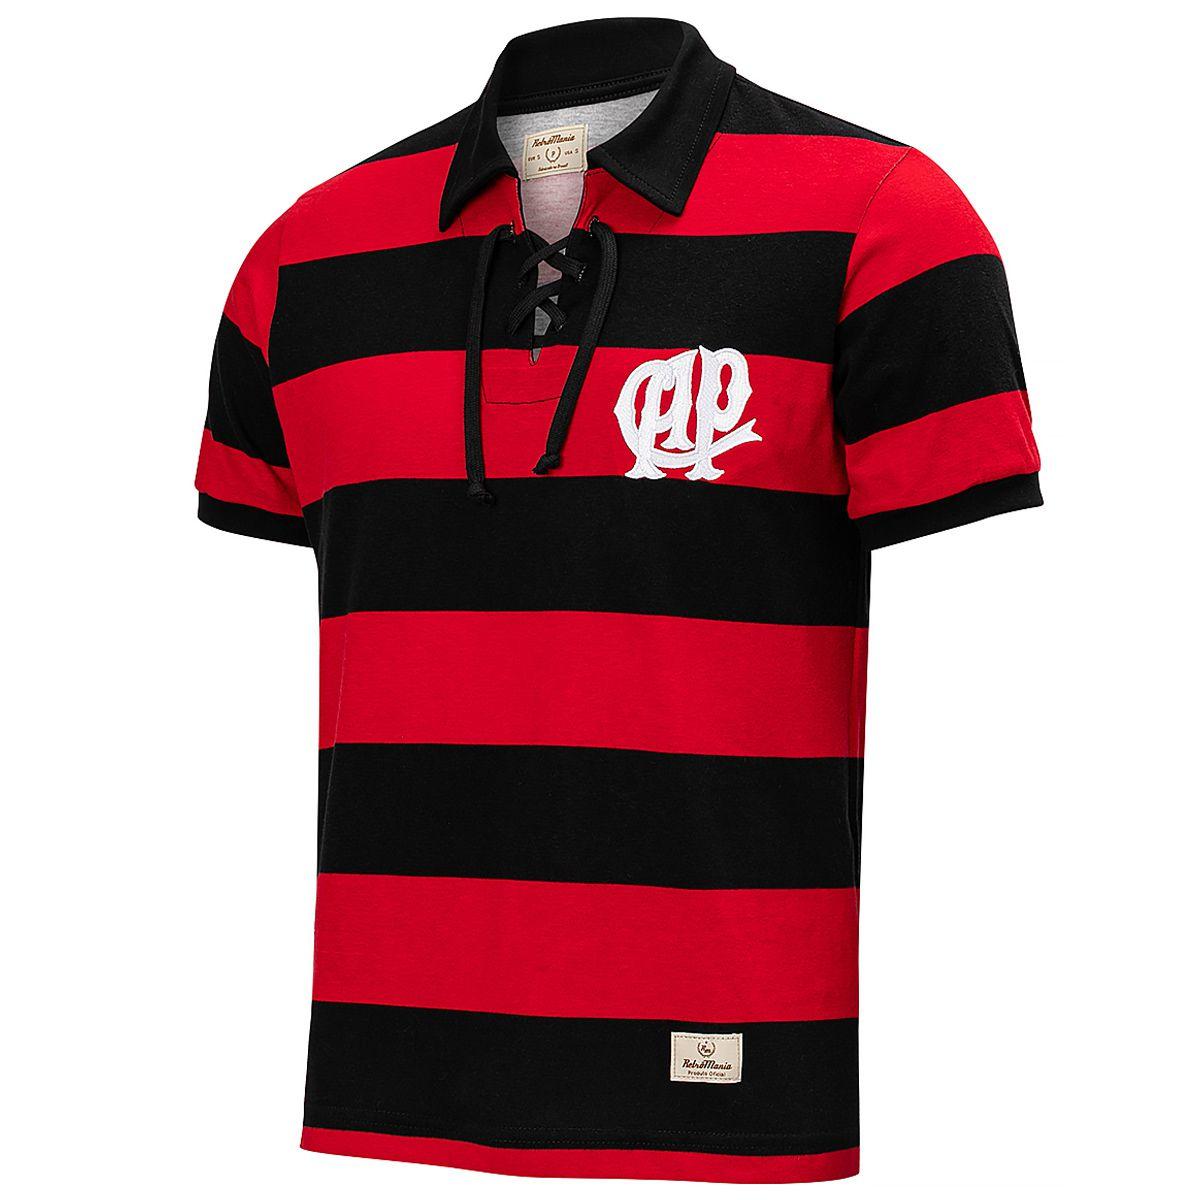 Camisa Athletico Paranaense Retrô 1924